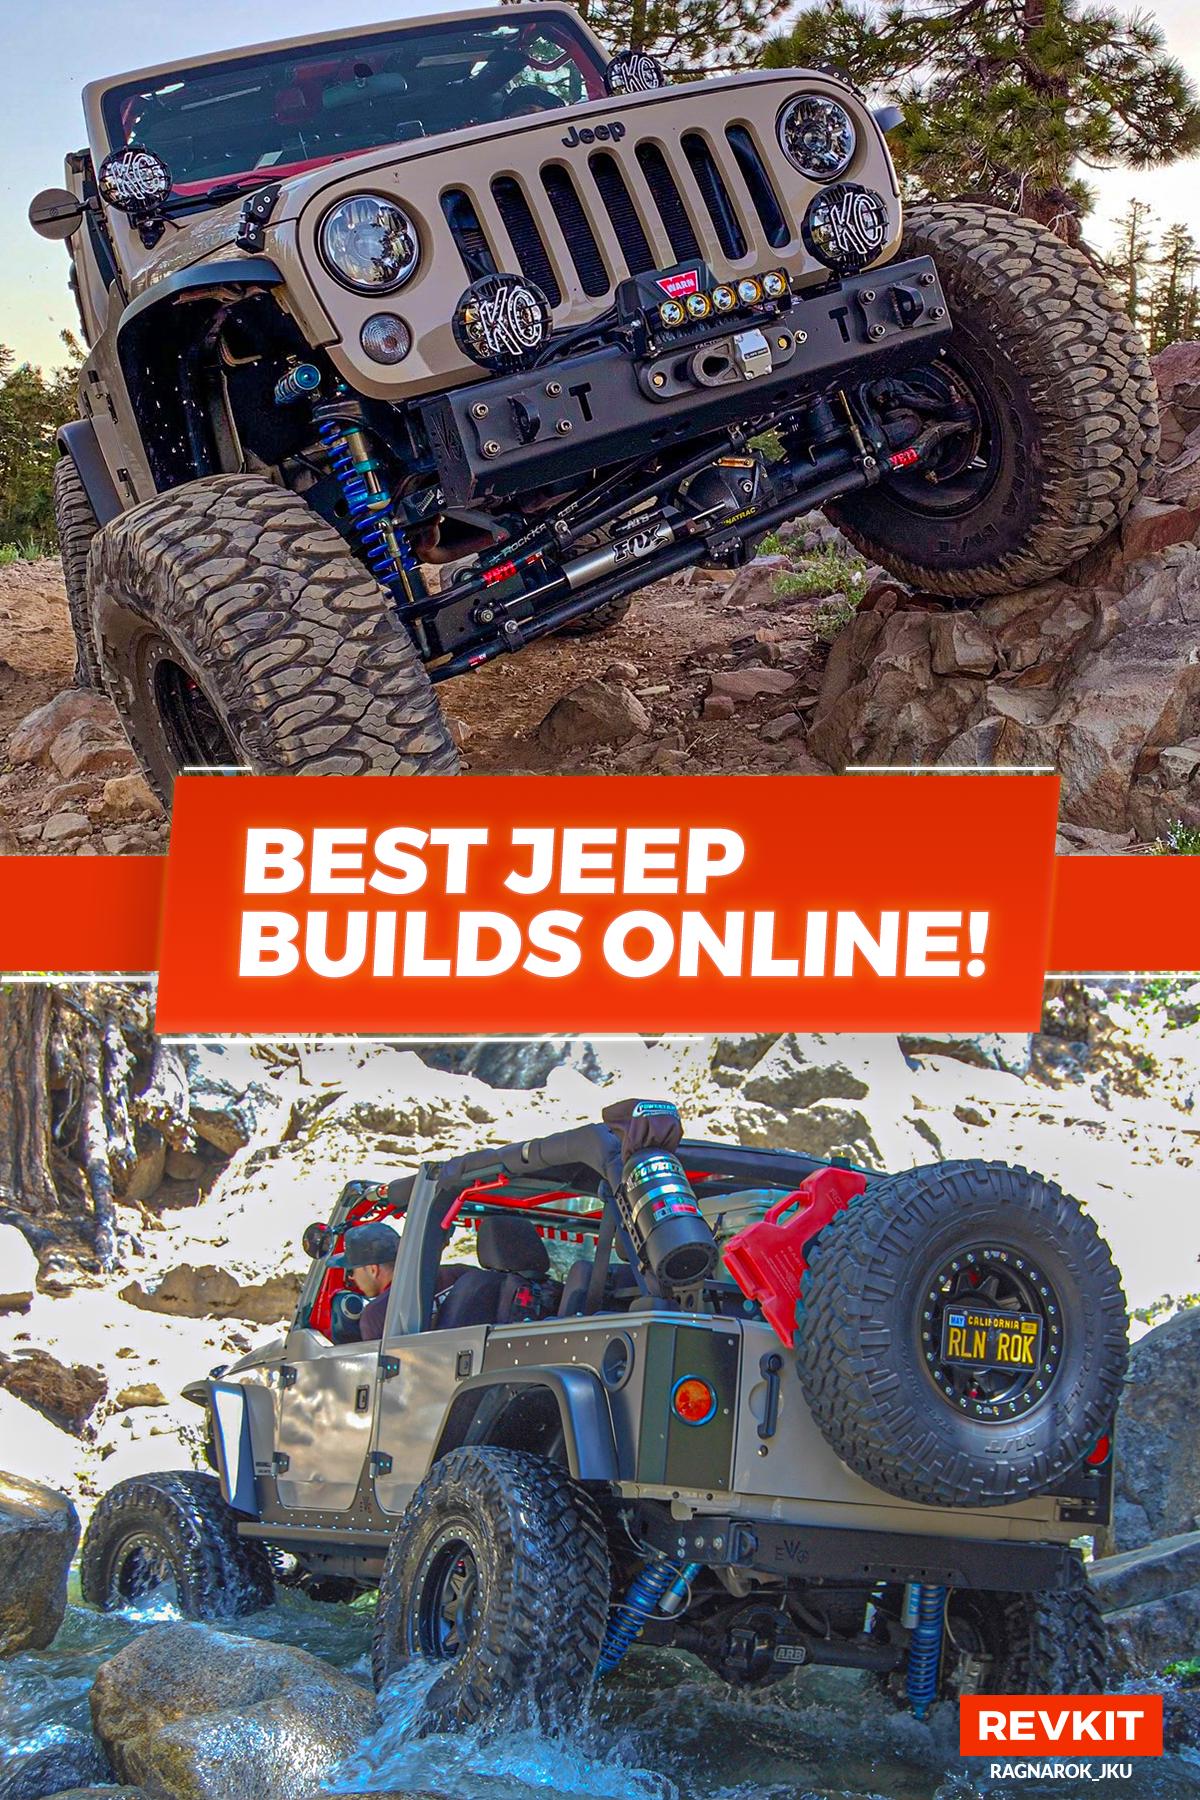 A 2016 Jeep Wrangler JKU Sport 4dr 4x4 build by Ragnarok